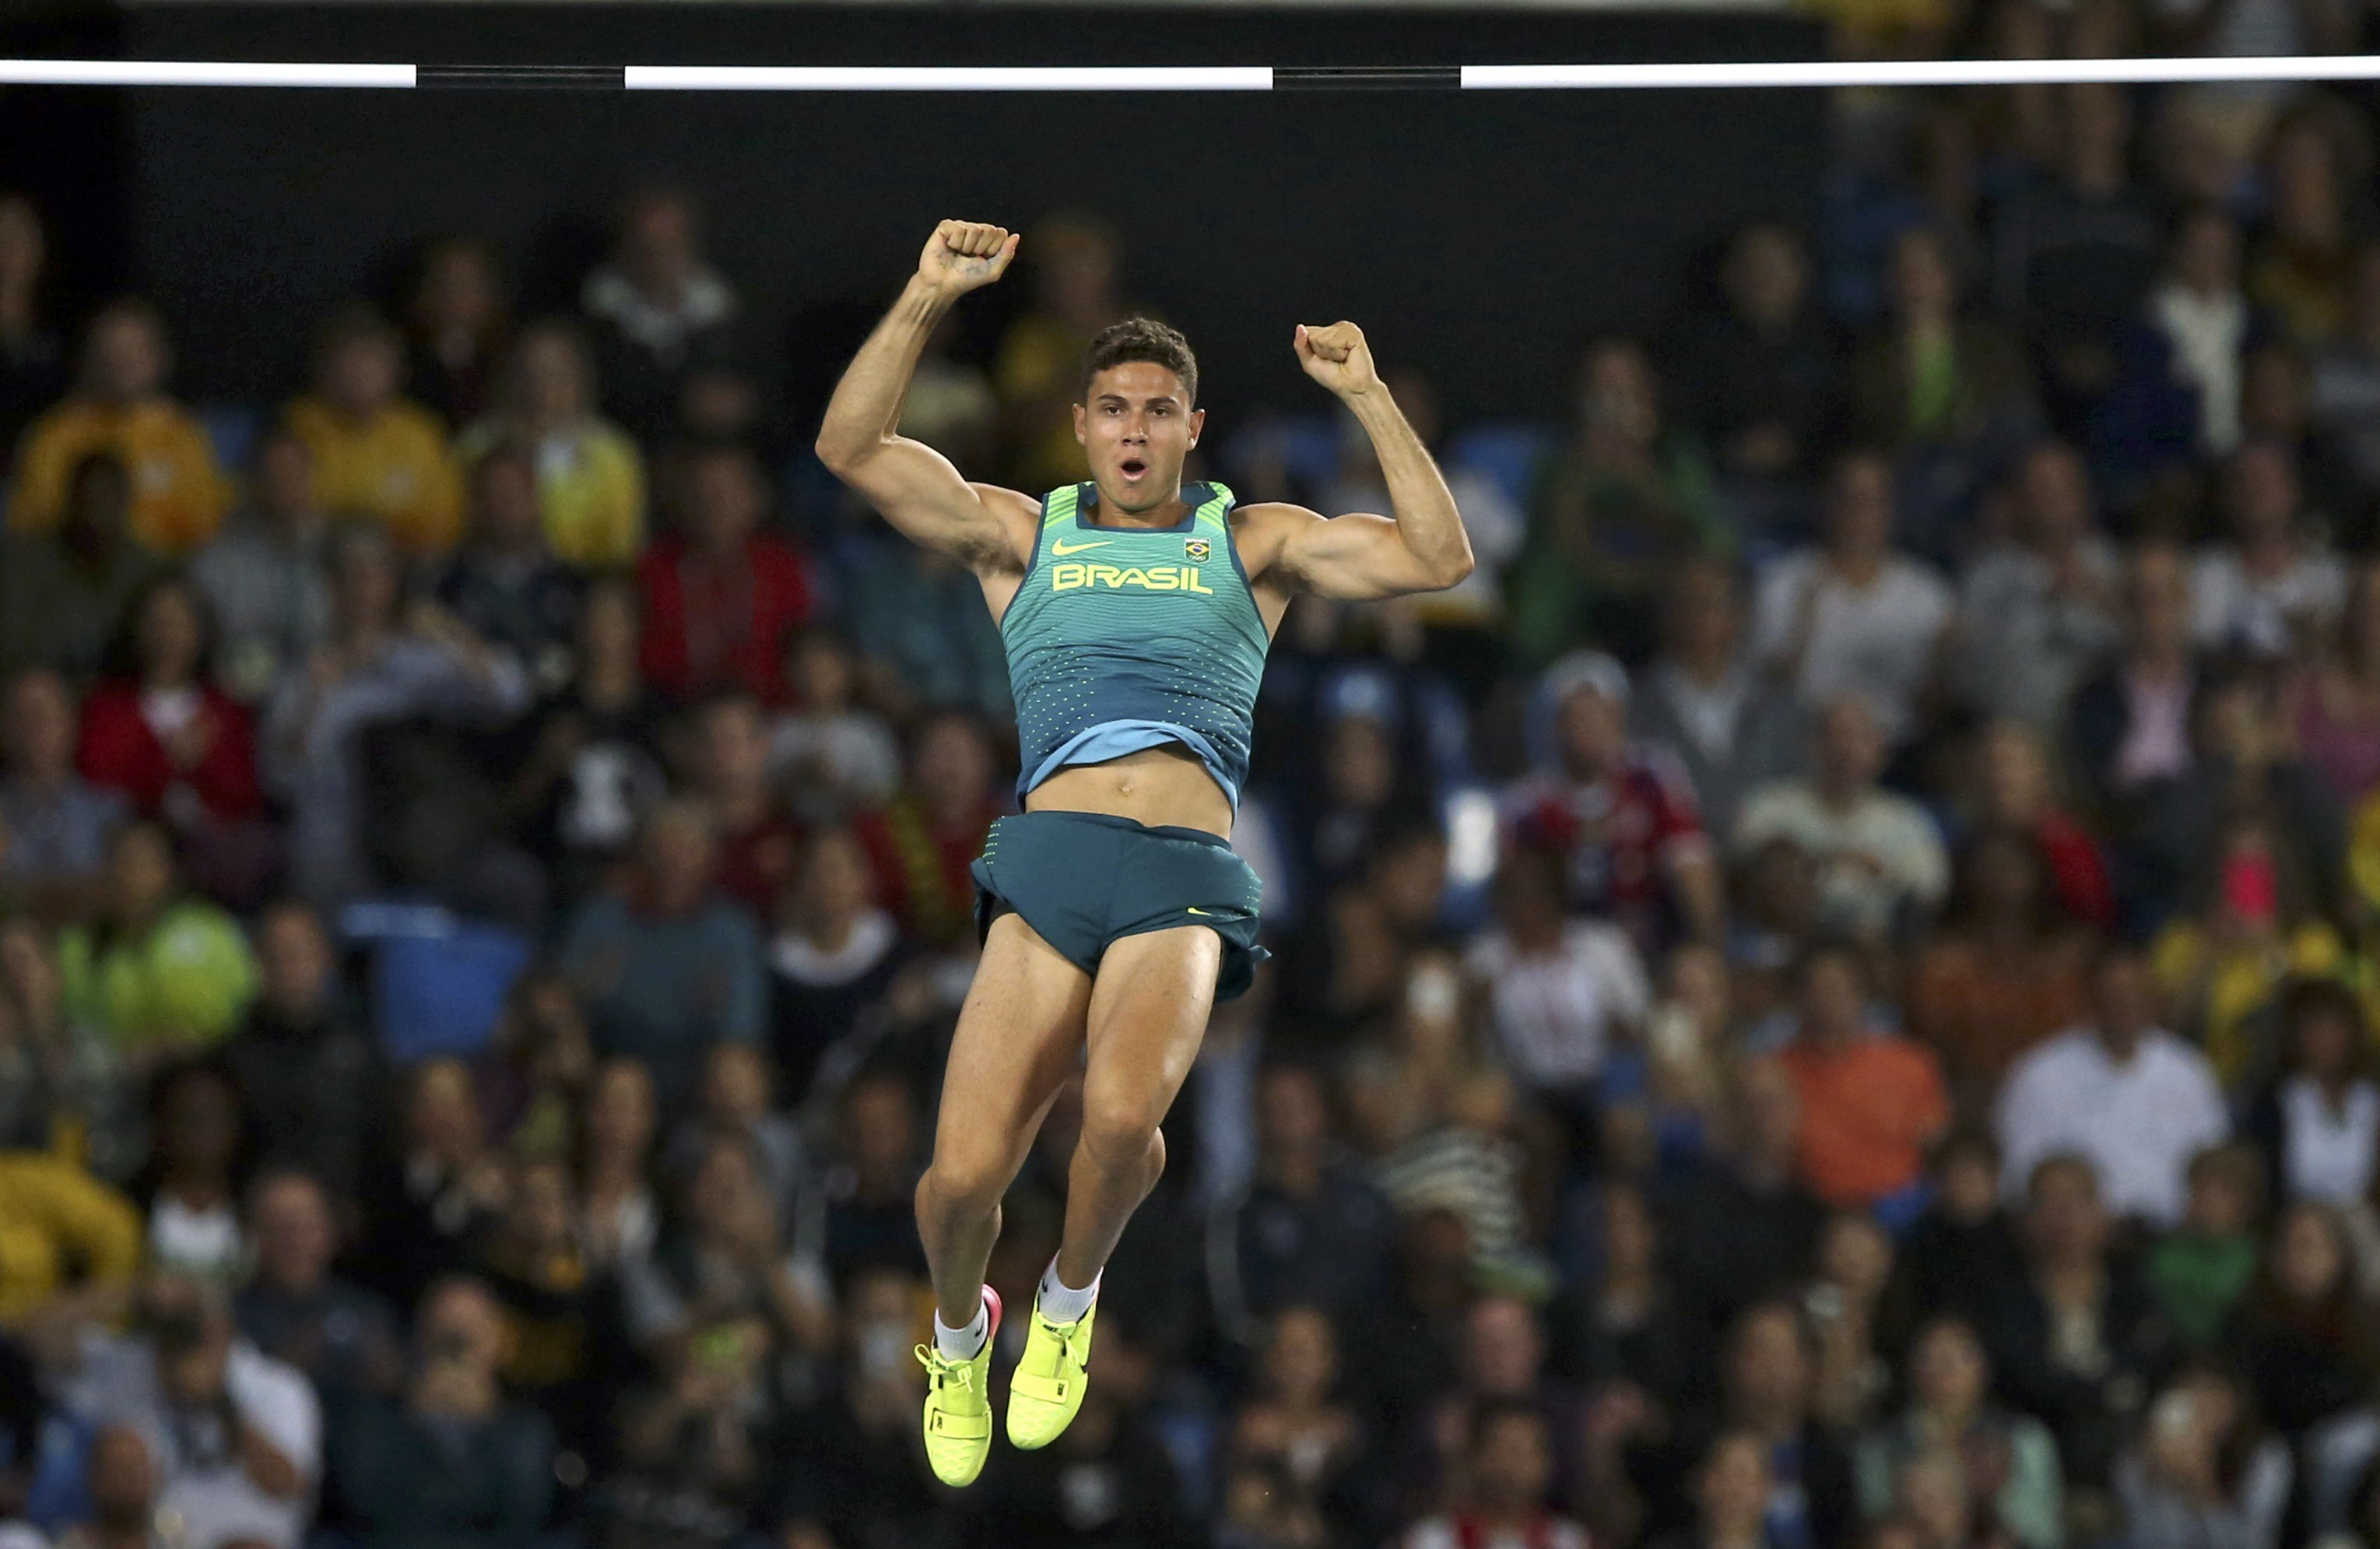 Esporte - olimpíadas - jogos olímpicos - rio de janeiro - Tiago Braz - ouro